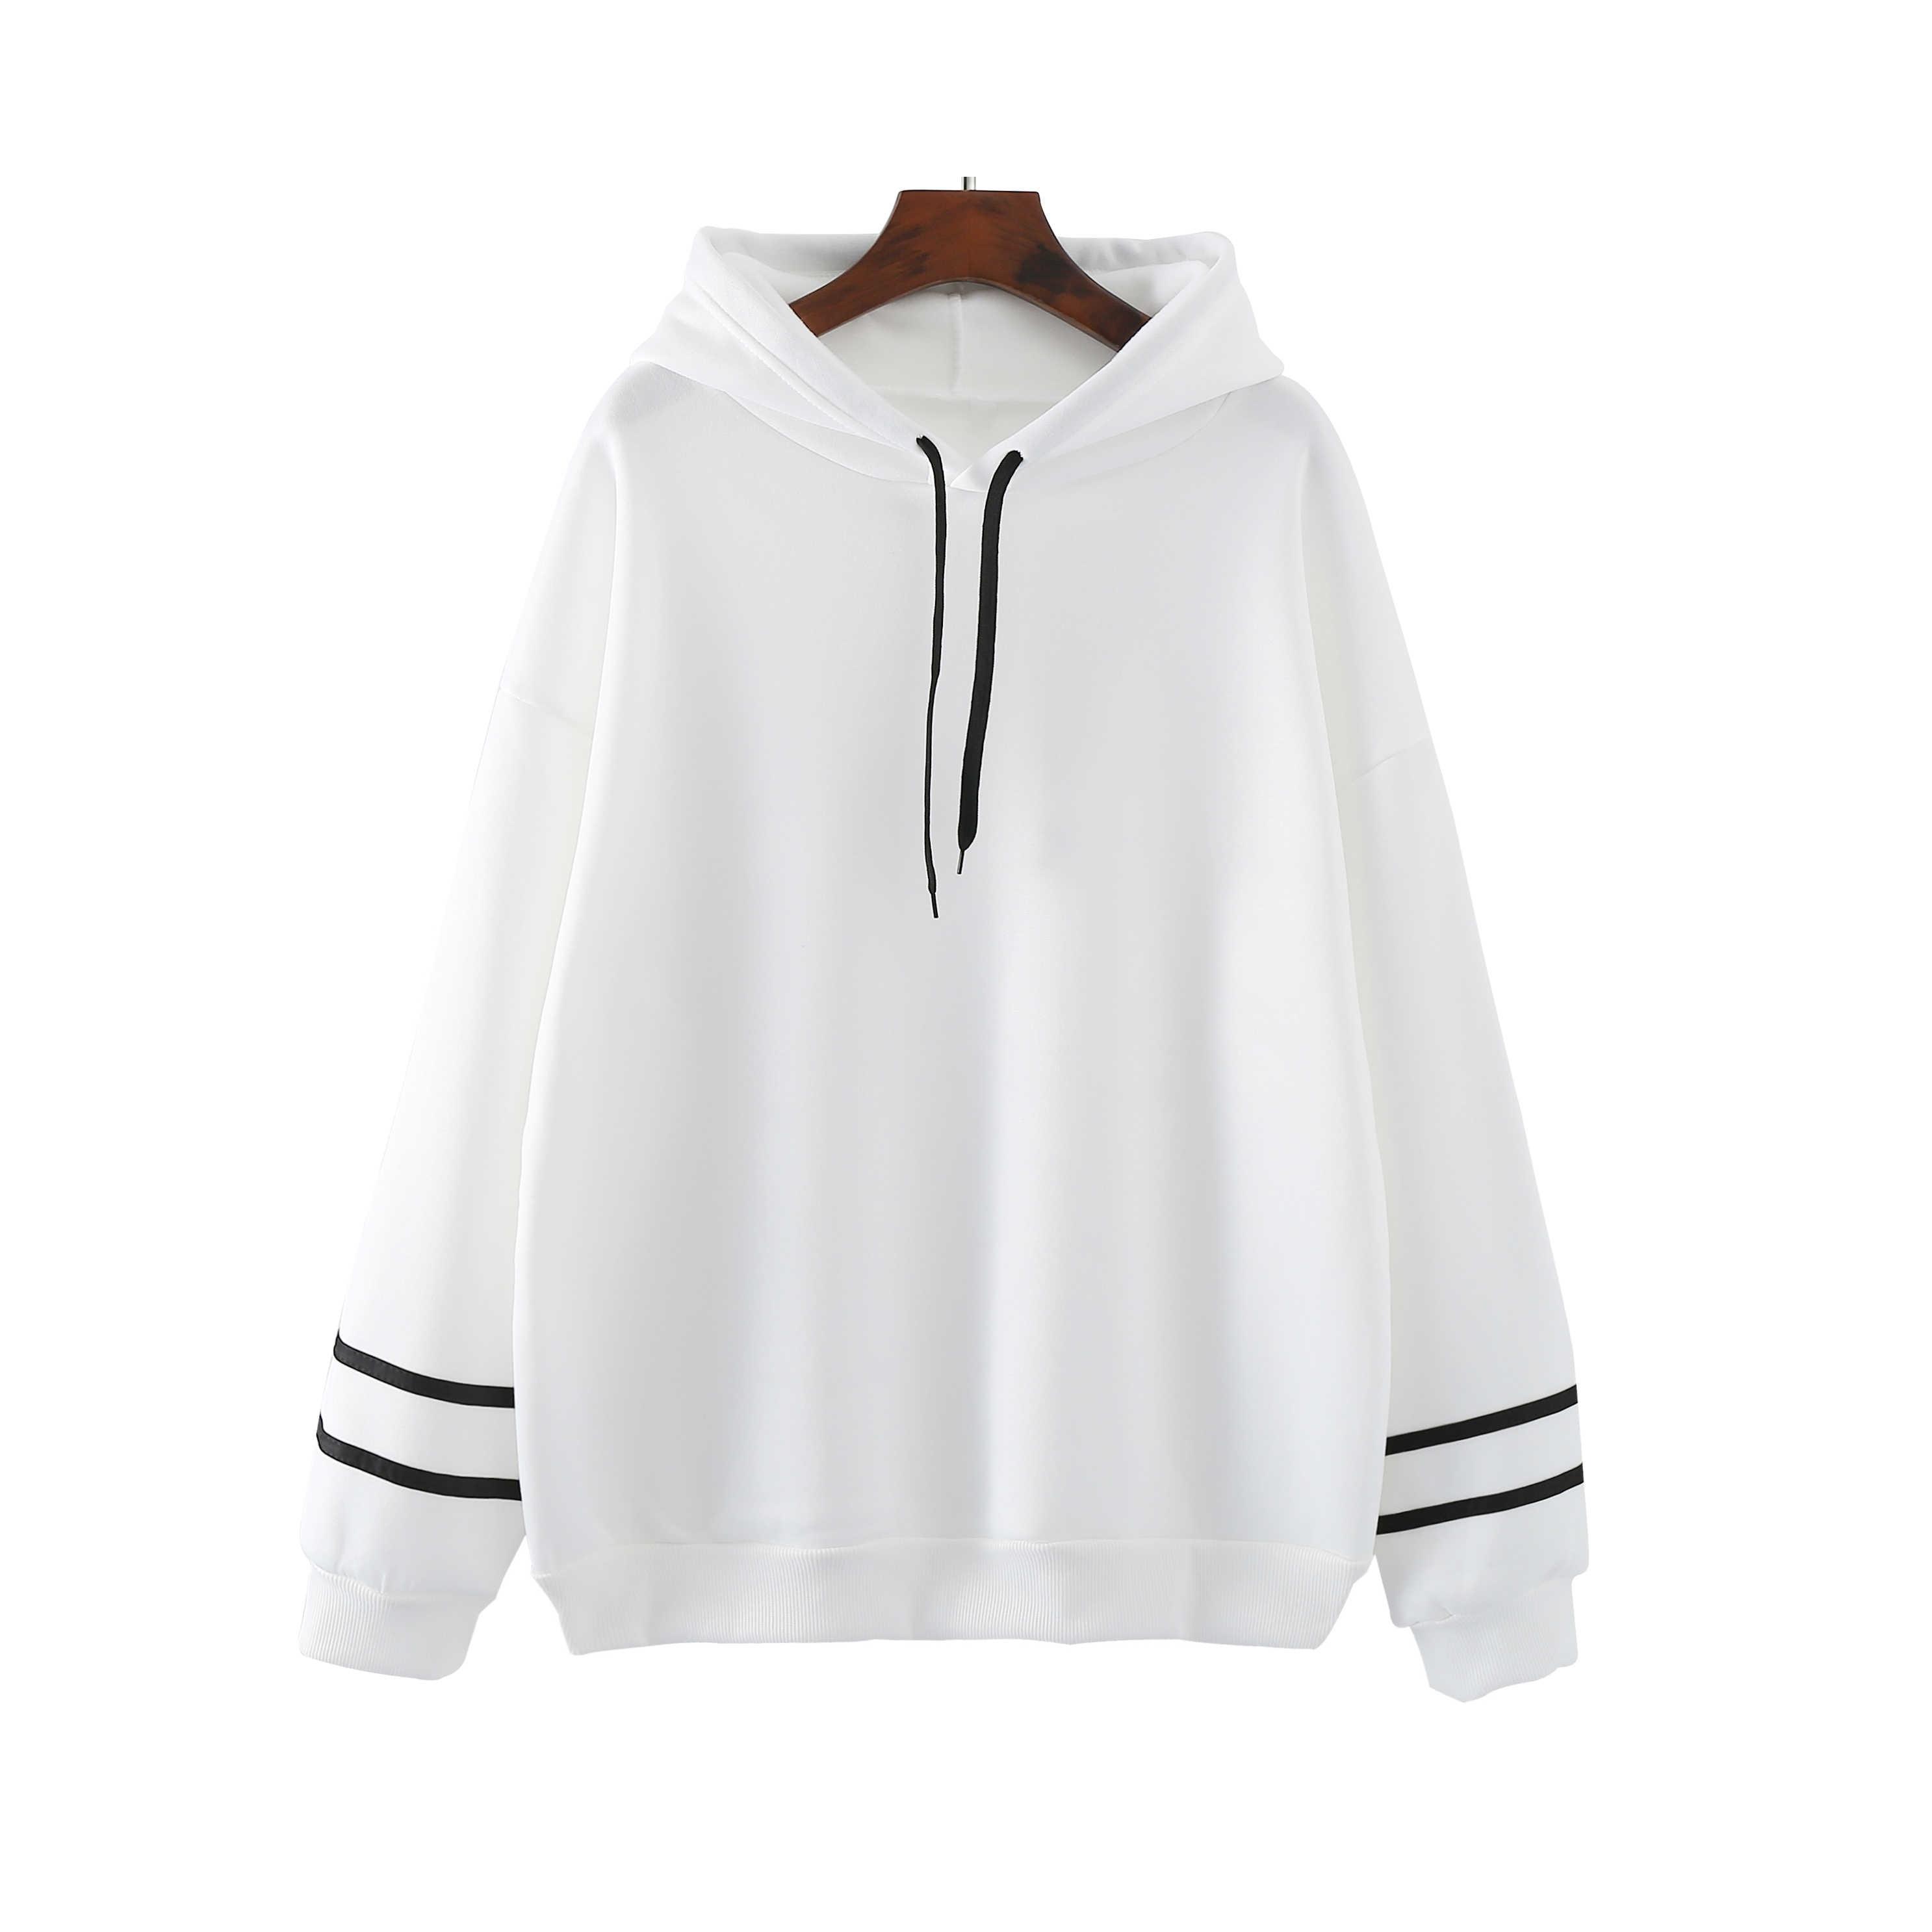 Michelangelo Gedrukt Harajuku Ulzzang Tumblr Vrouwen Sweatshirts Winter Warm Grappig Hip Hop Sweatshirts Streetwear Tops